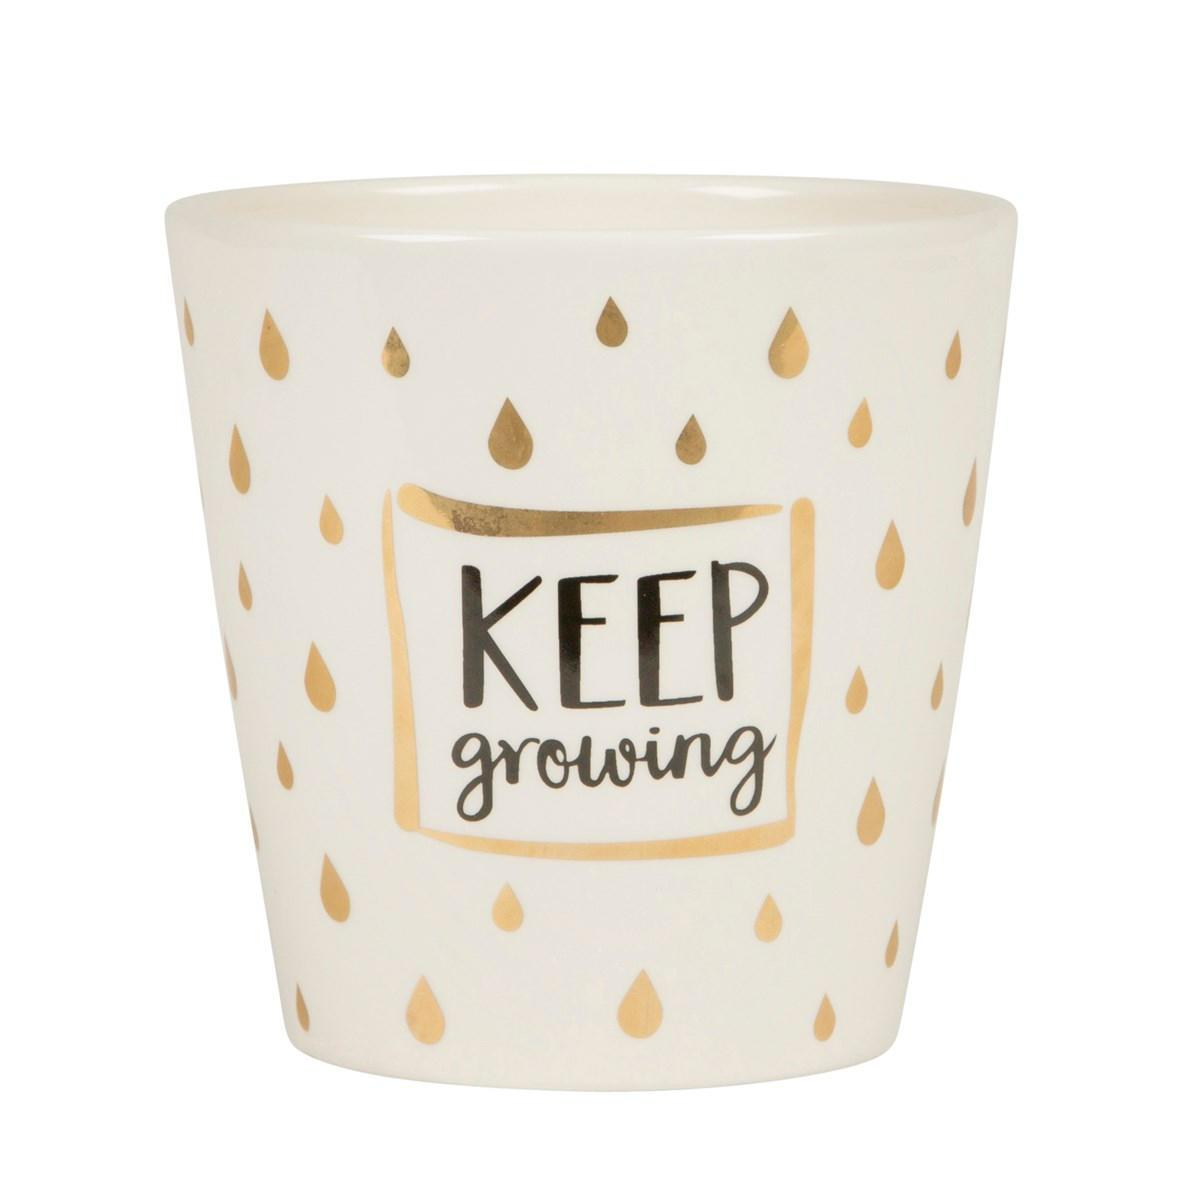 sass & belle Keramický obal na květináč Keep growing, zlatá barva, krémová barva, keramika 13,5cmx14cm